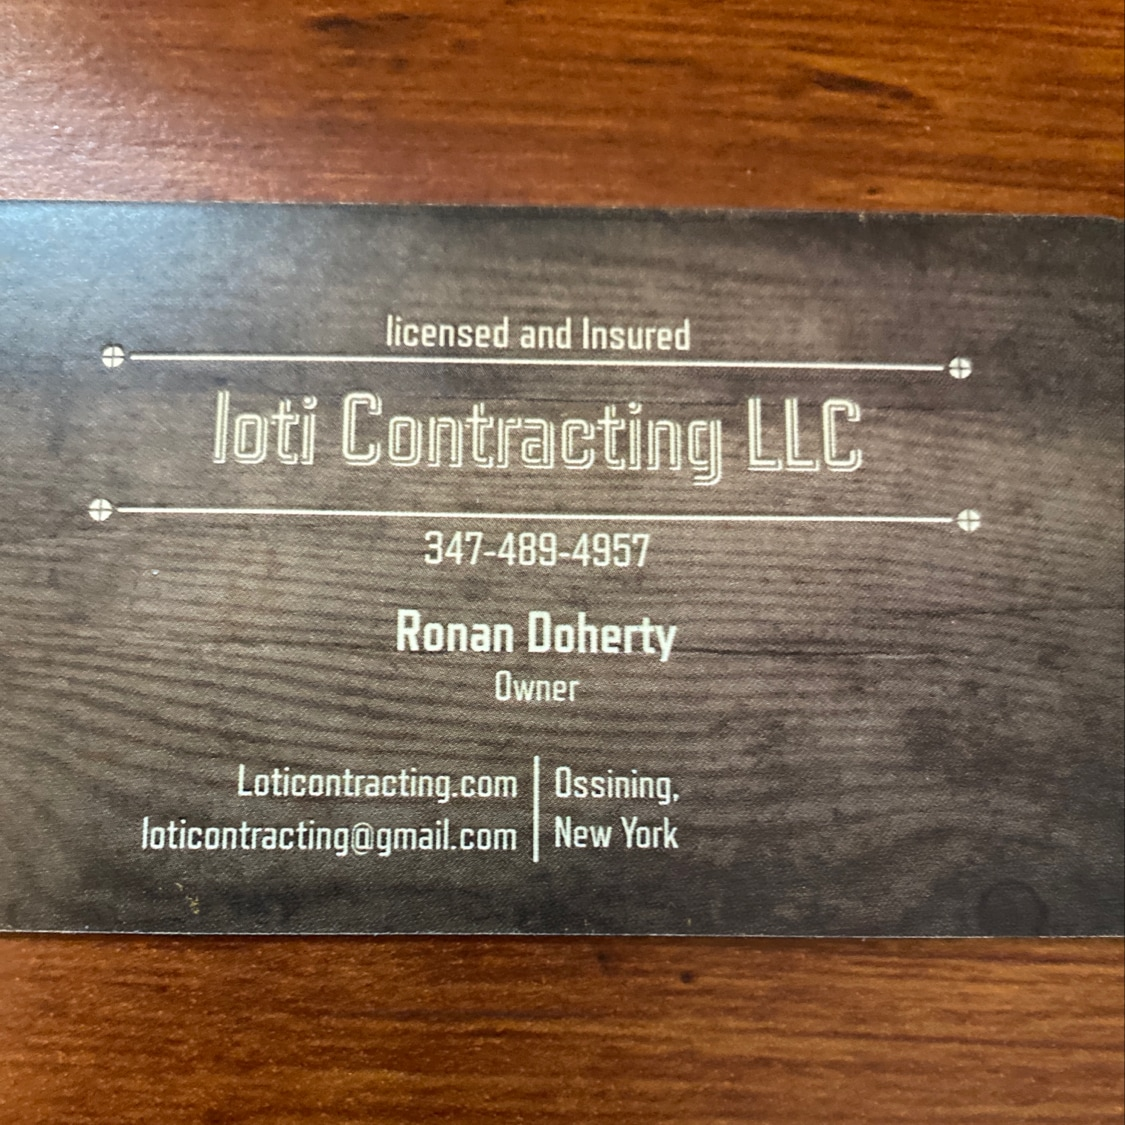 Loti Contracting